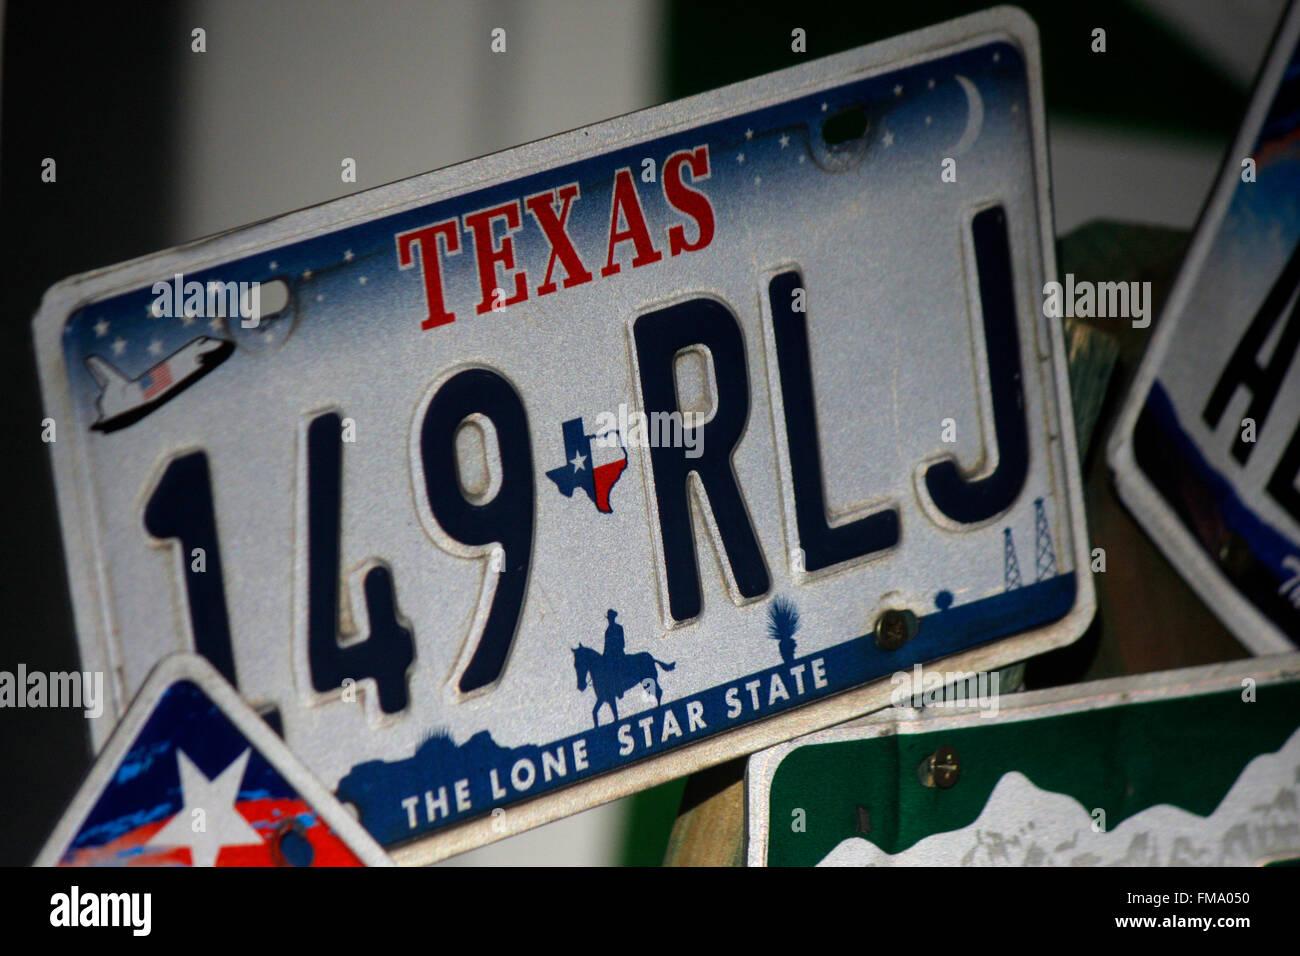 Us License Plate Stockfotos & Us License Plate Bilder - Alamy